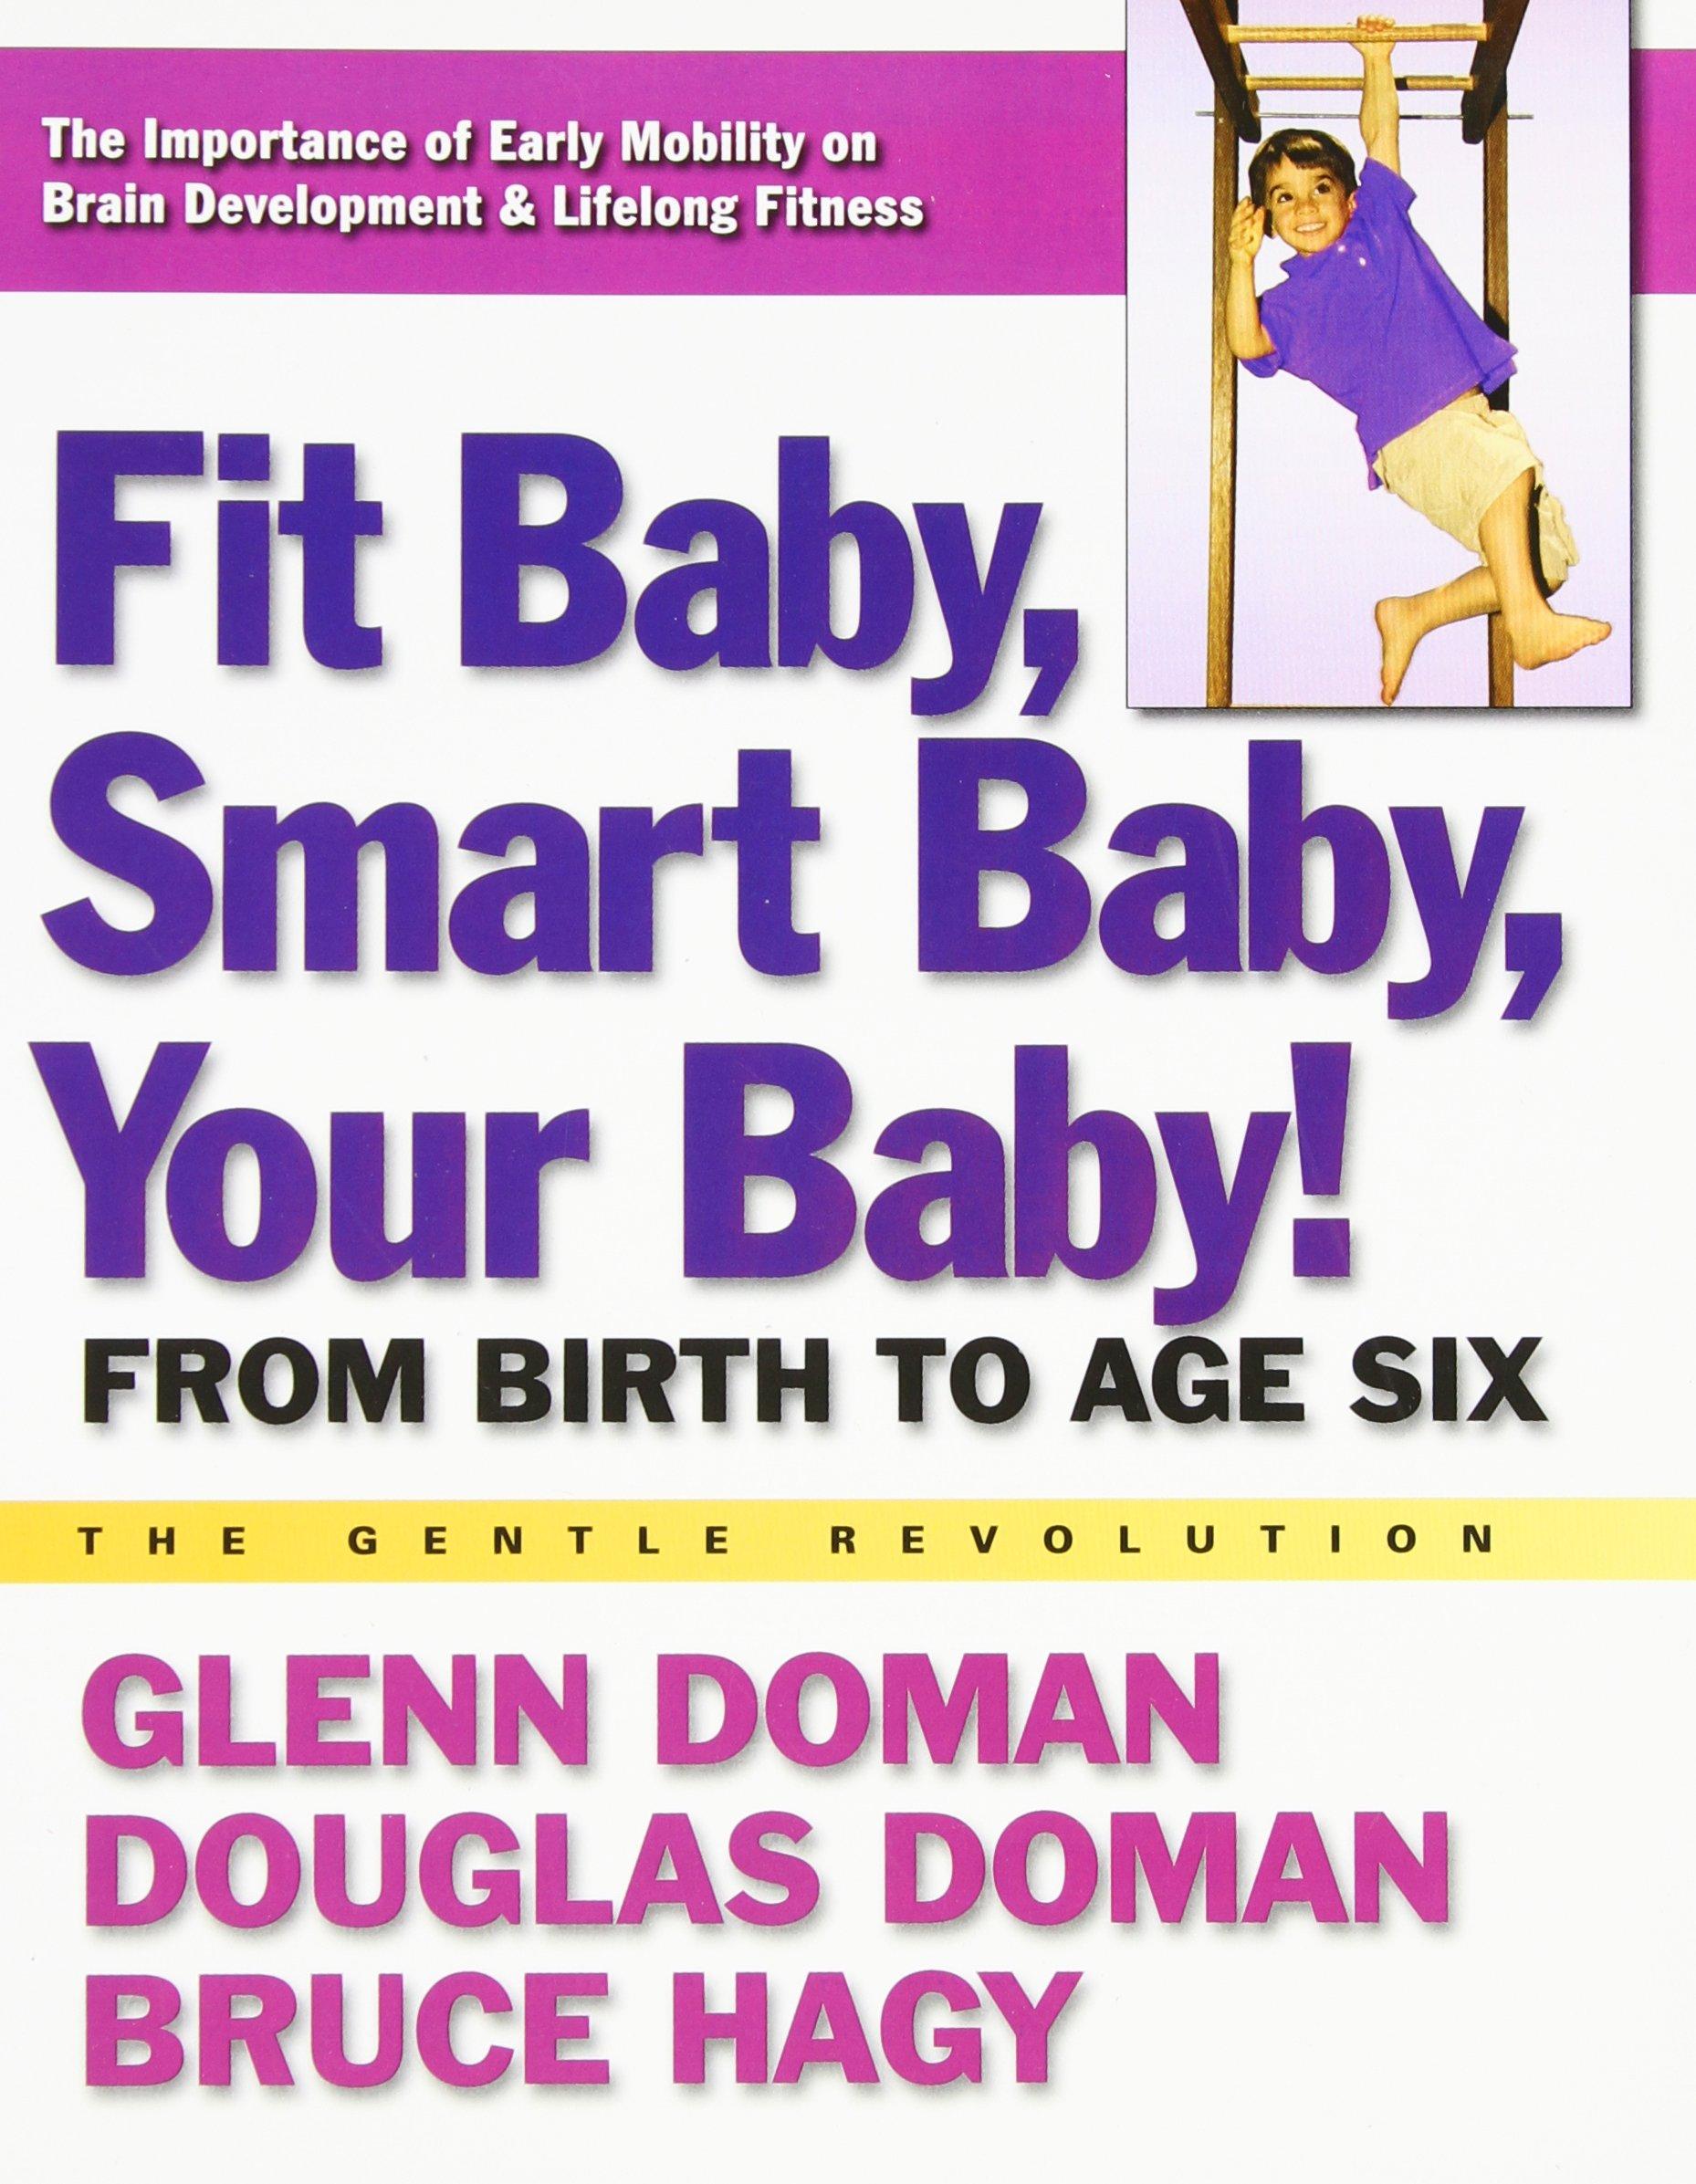 Glen Doman: The Early Development Methodology